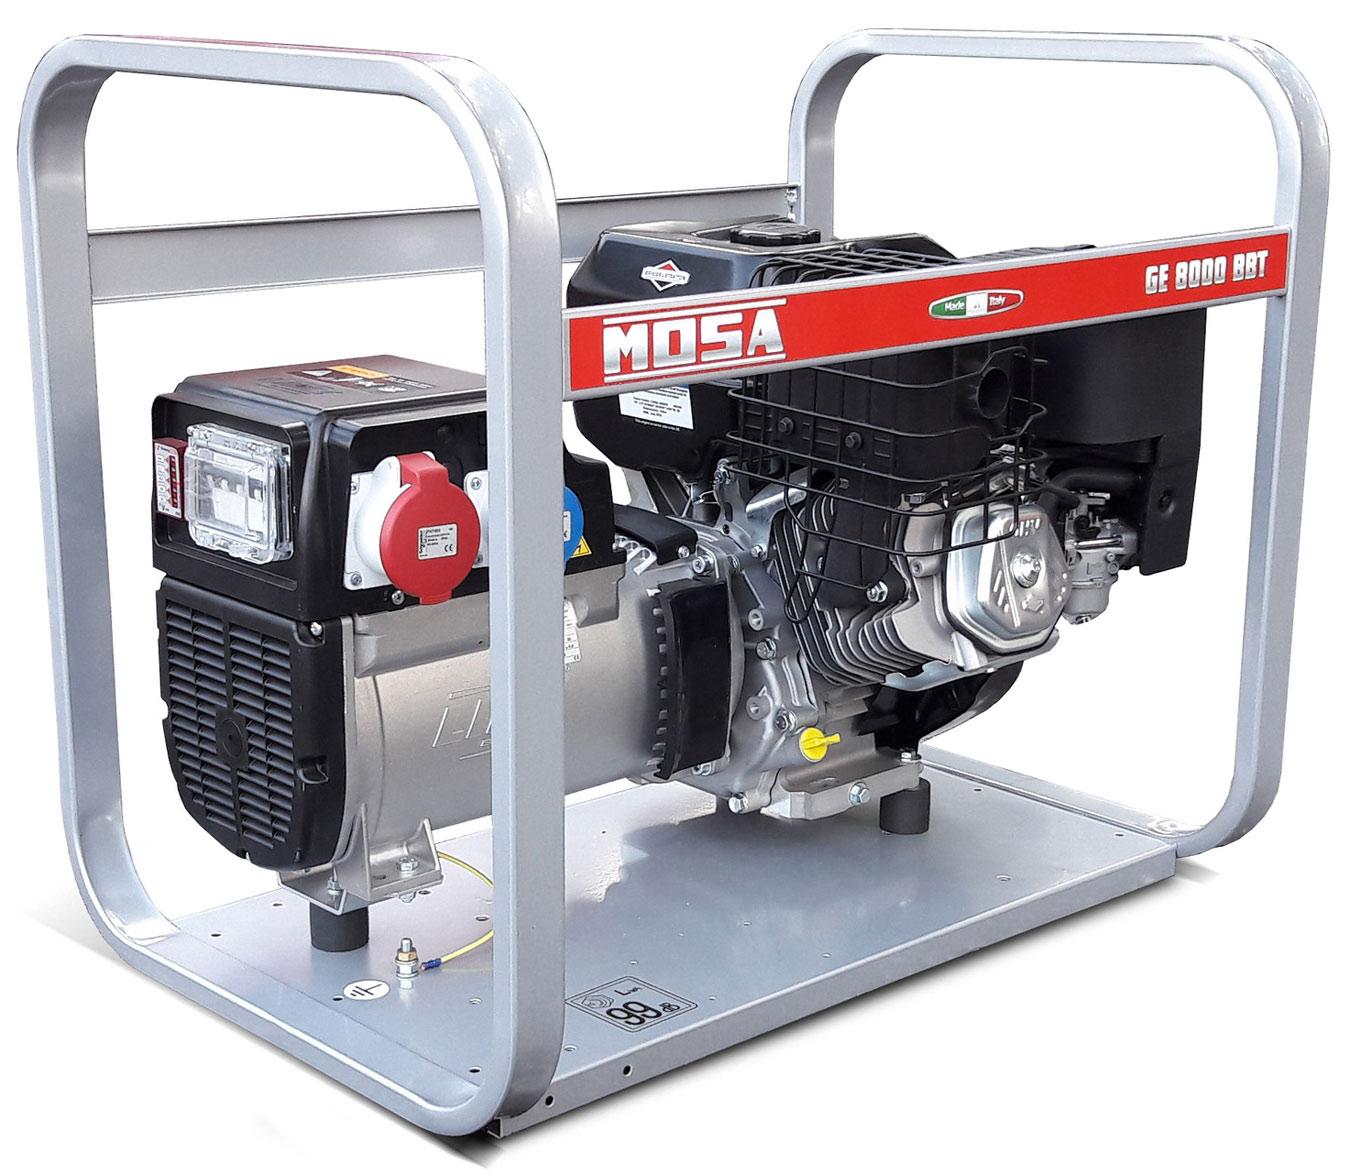 Generatore di corrente mosa ge 8000 bbt 5 6kw trifase for Generatore di corrente bricoman